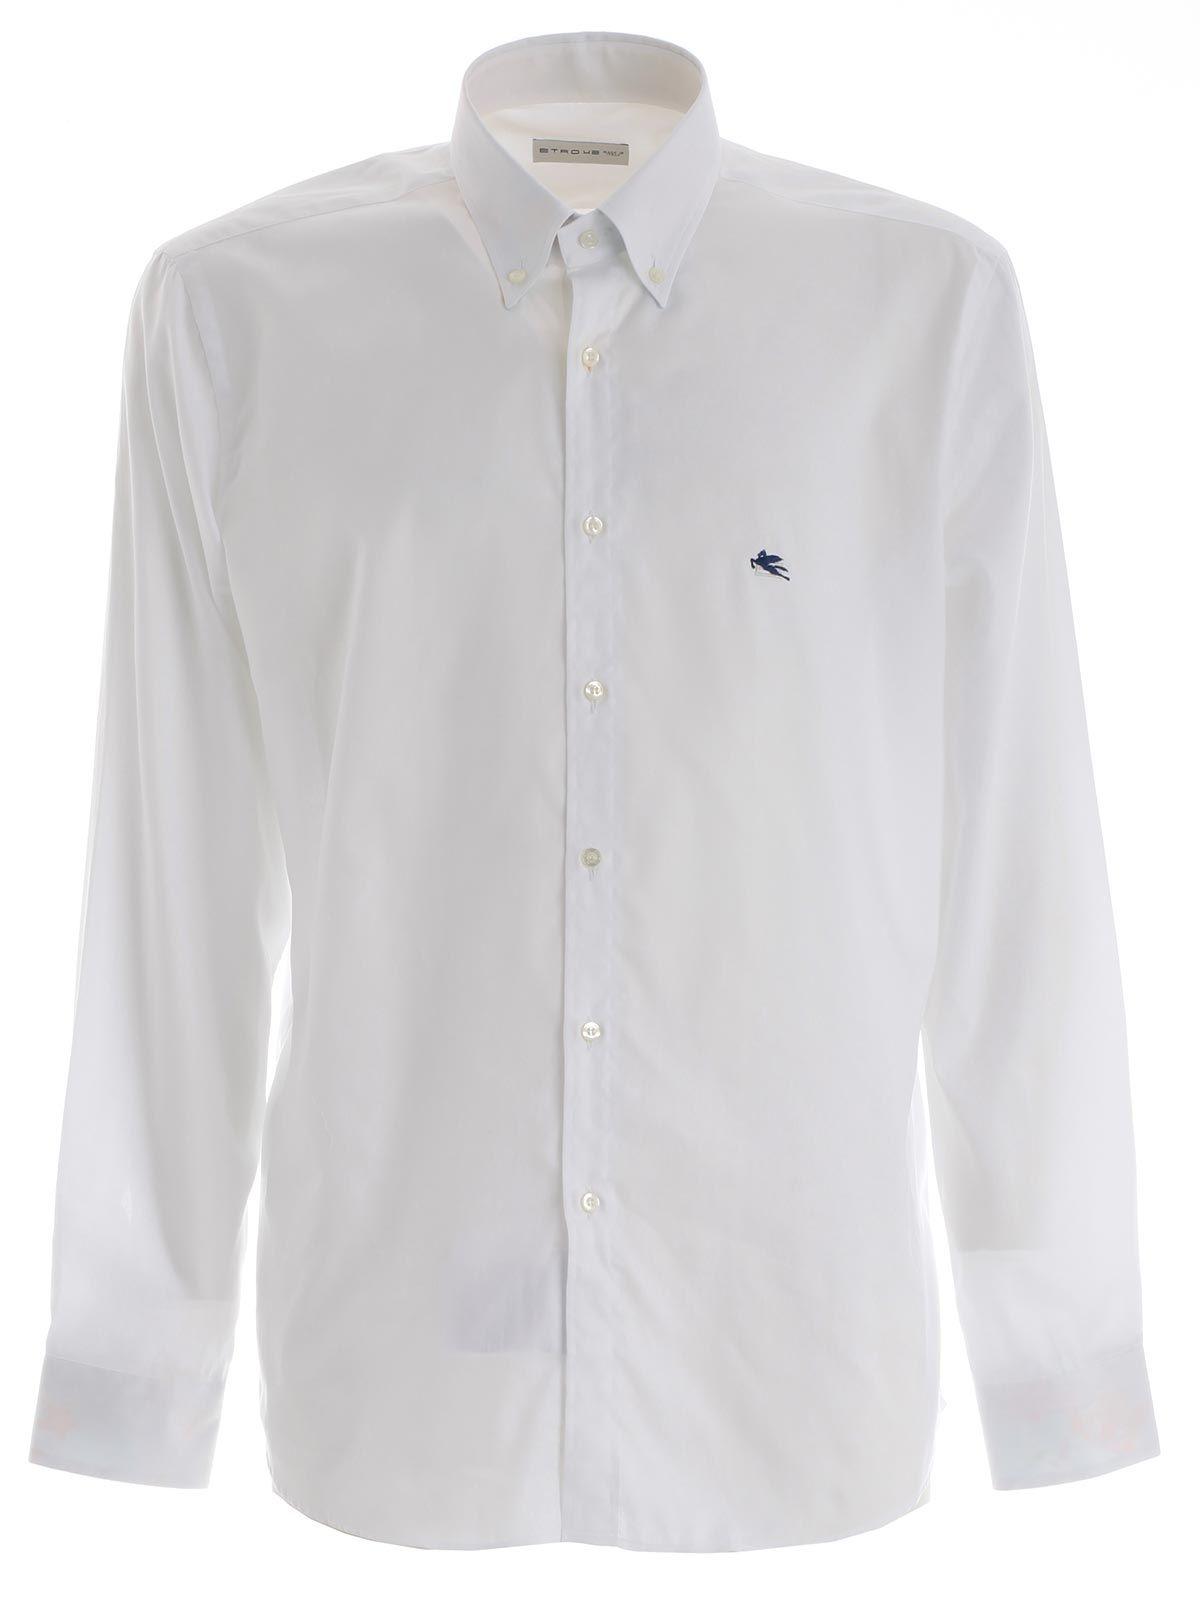 Etro etro shirt white men 39 s shirts italist for Etro men s shirts